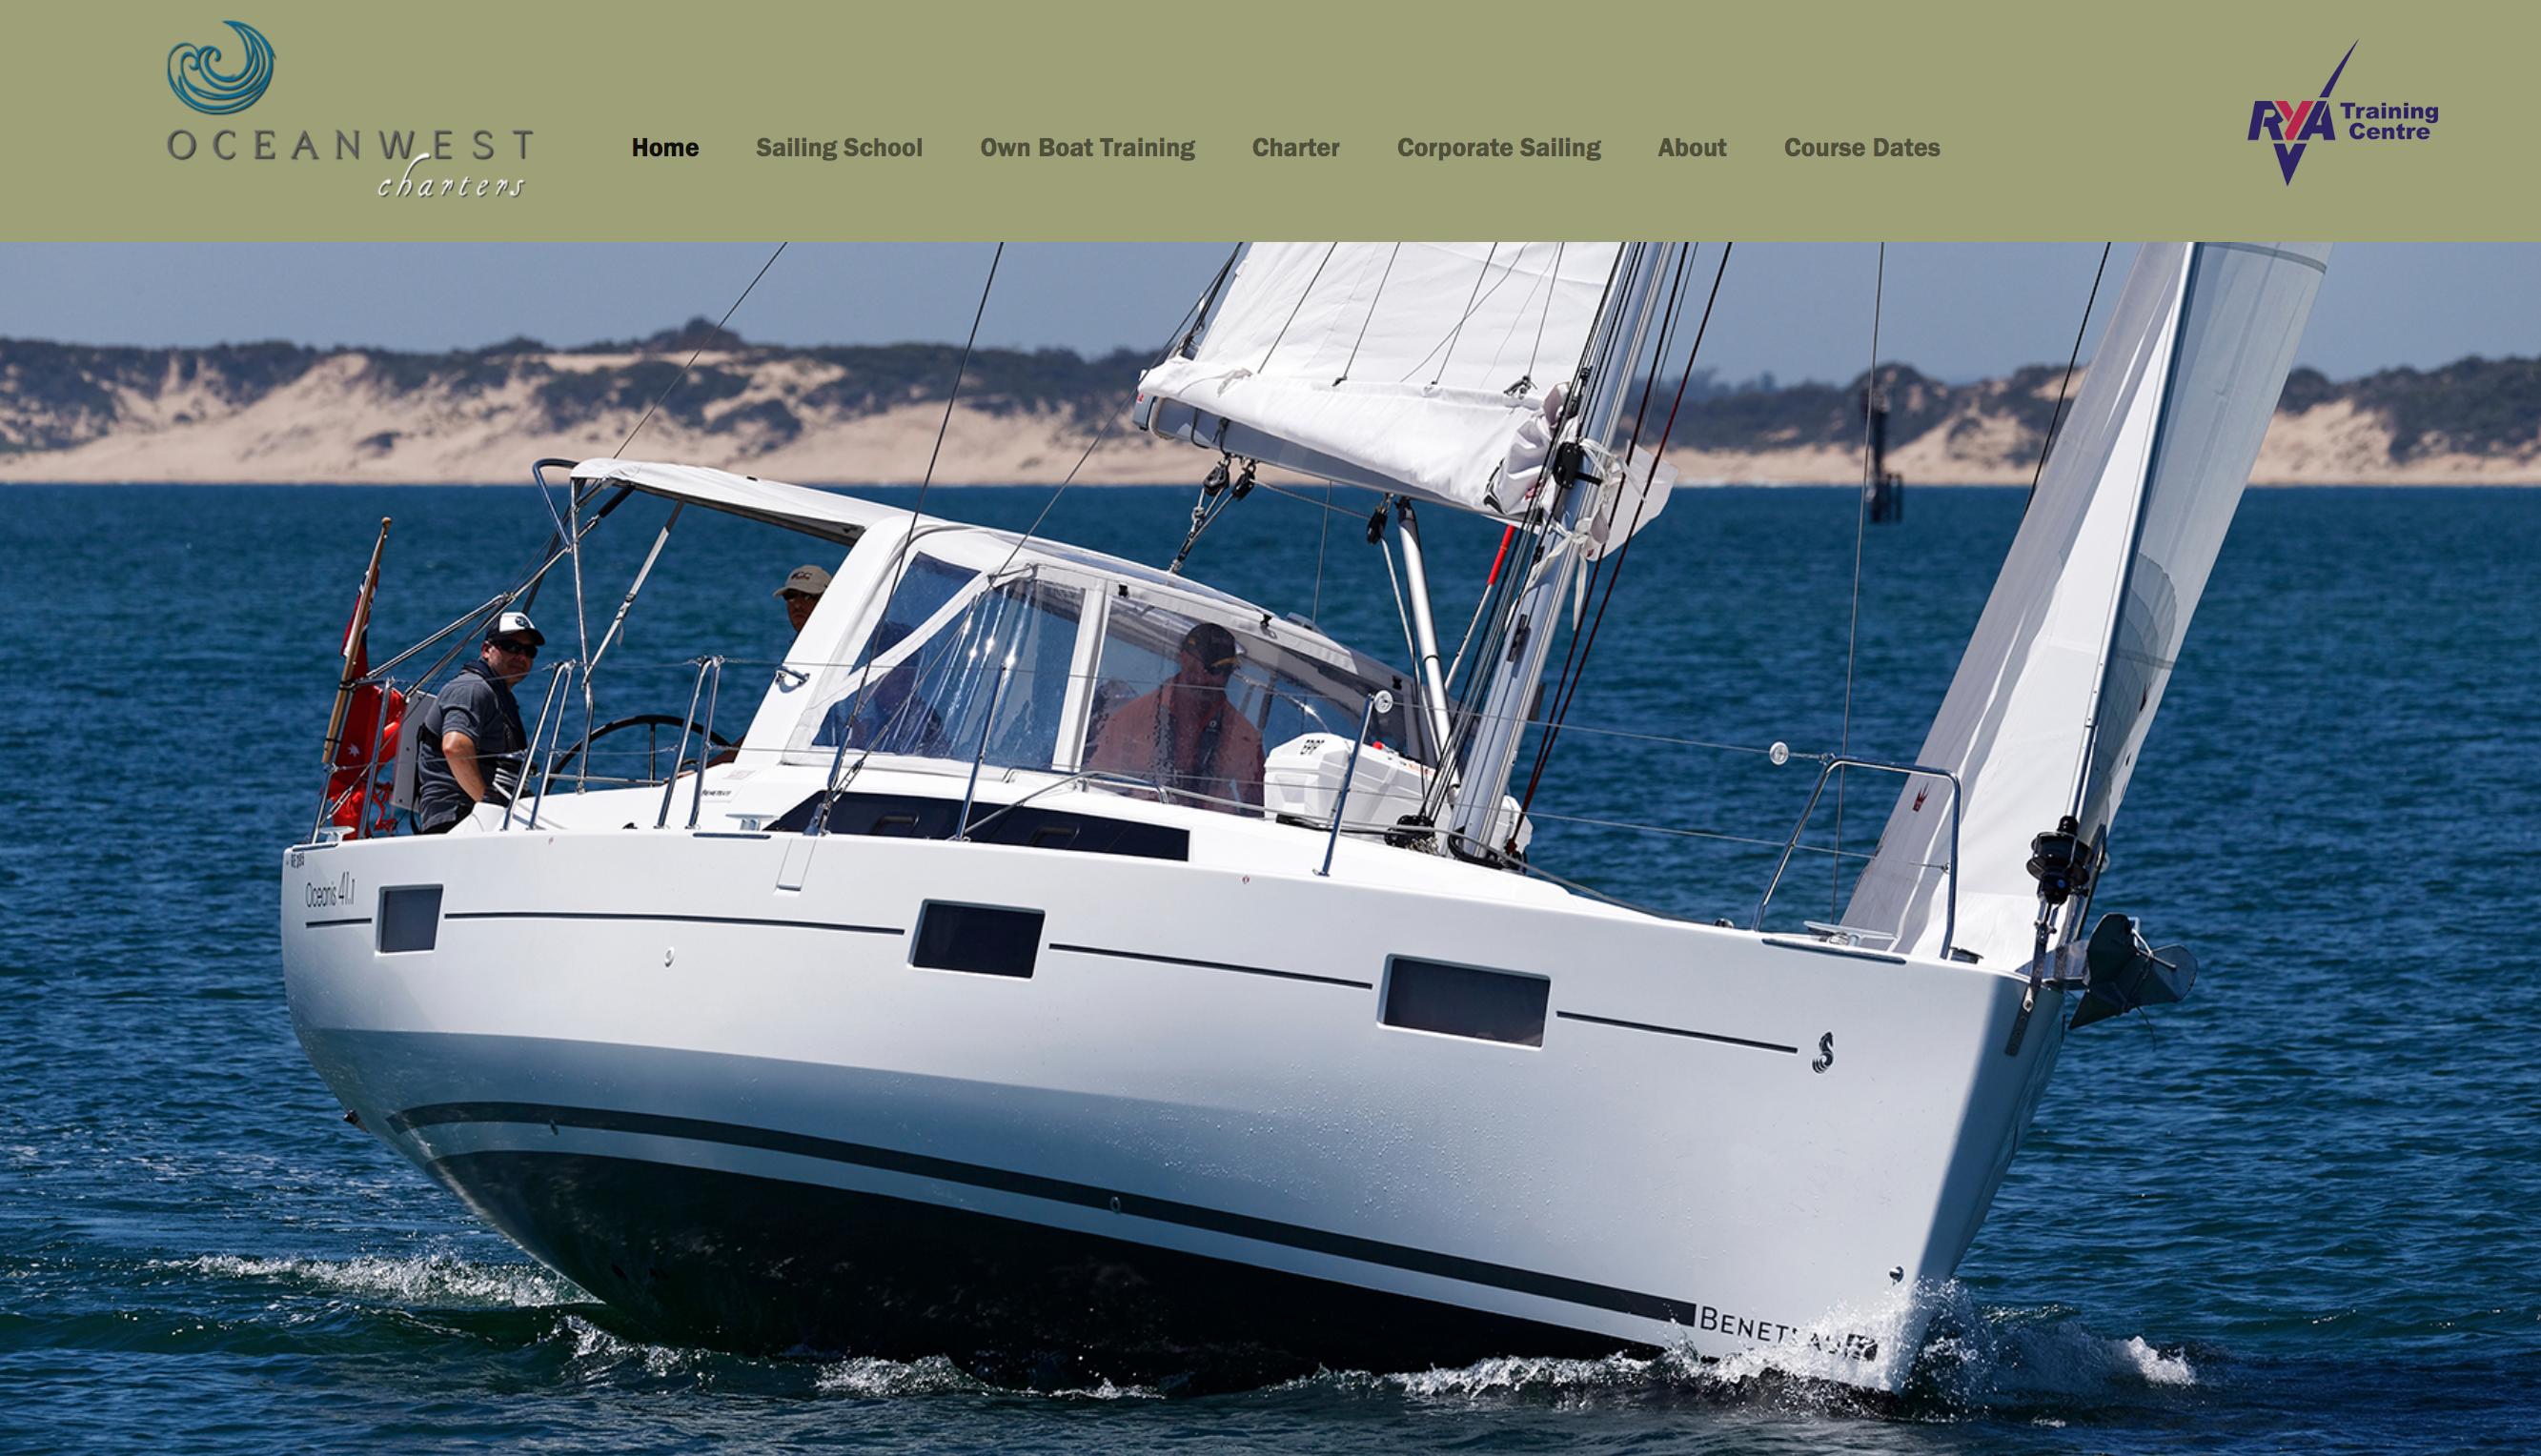 Ocean West Sailing School